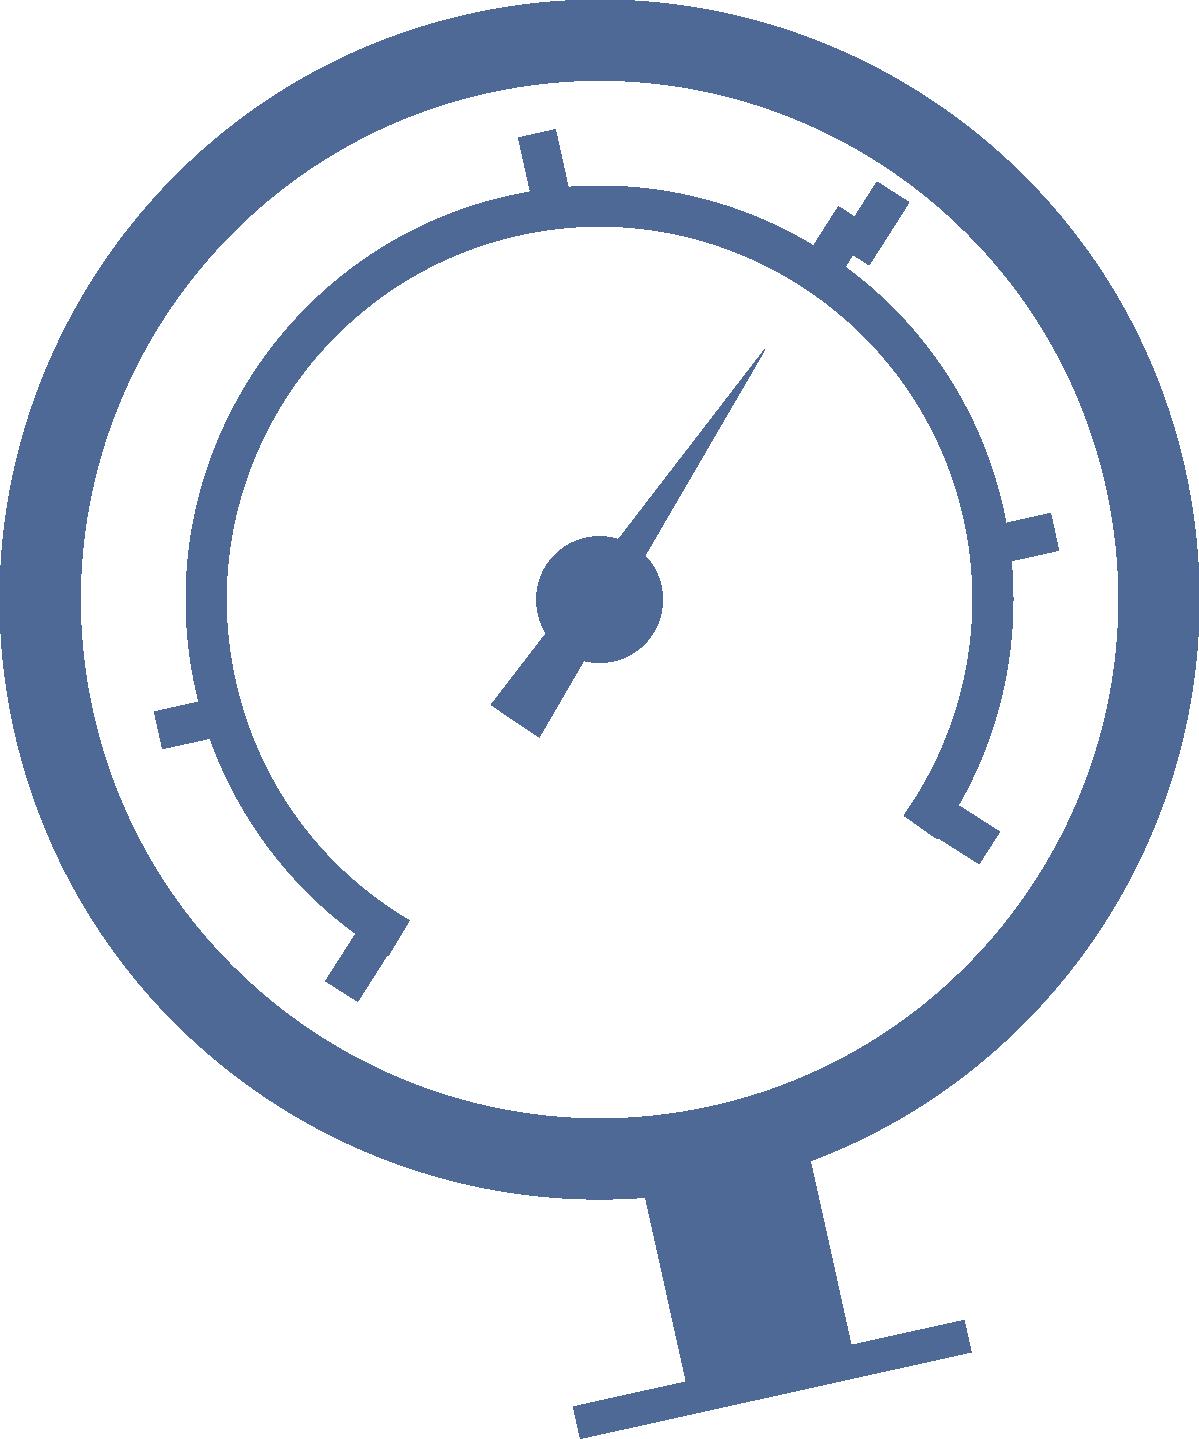 A autoclavable pressure gauge. Heat clipart temperature sensor